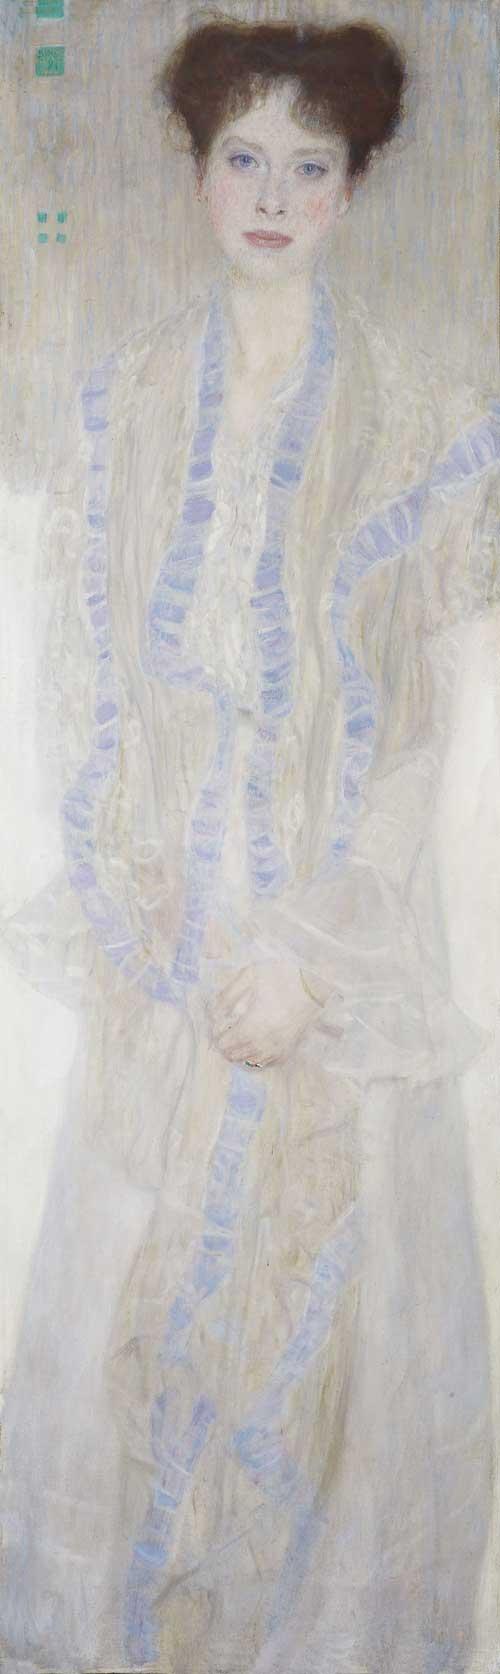 Gustav Klimt, Portret Gertrudy Loew, 1902